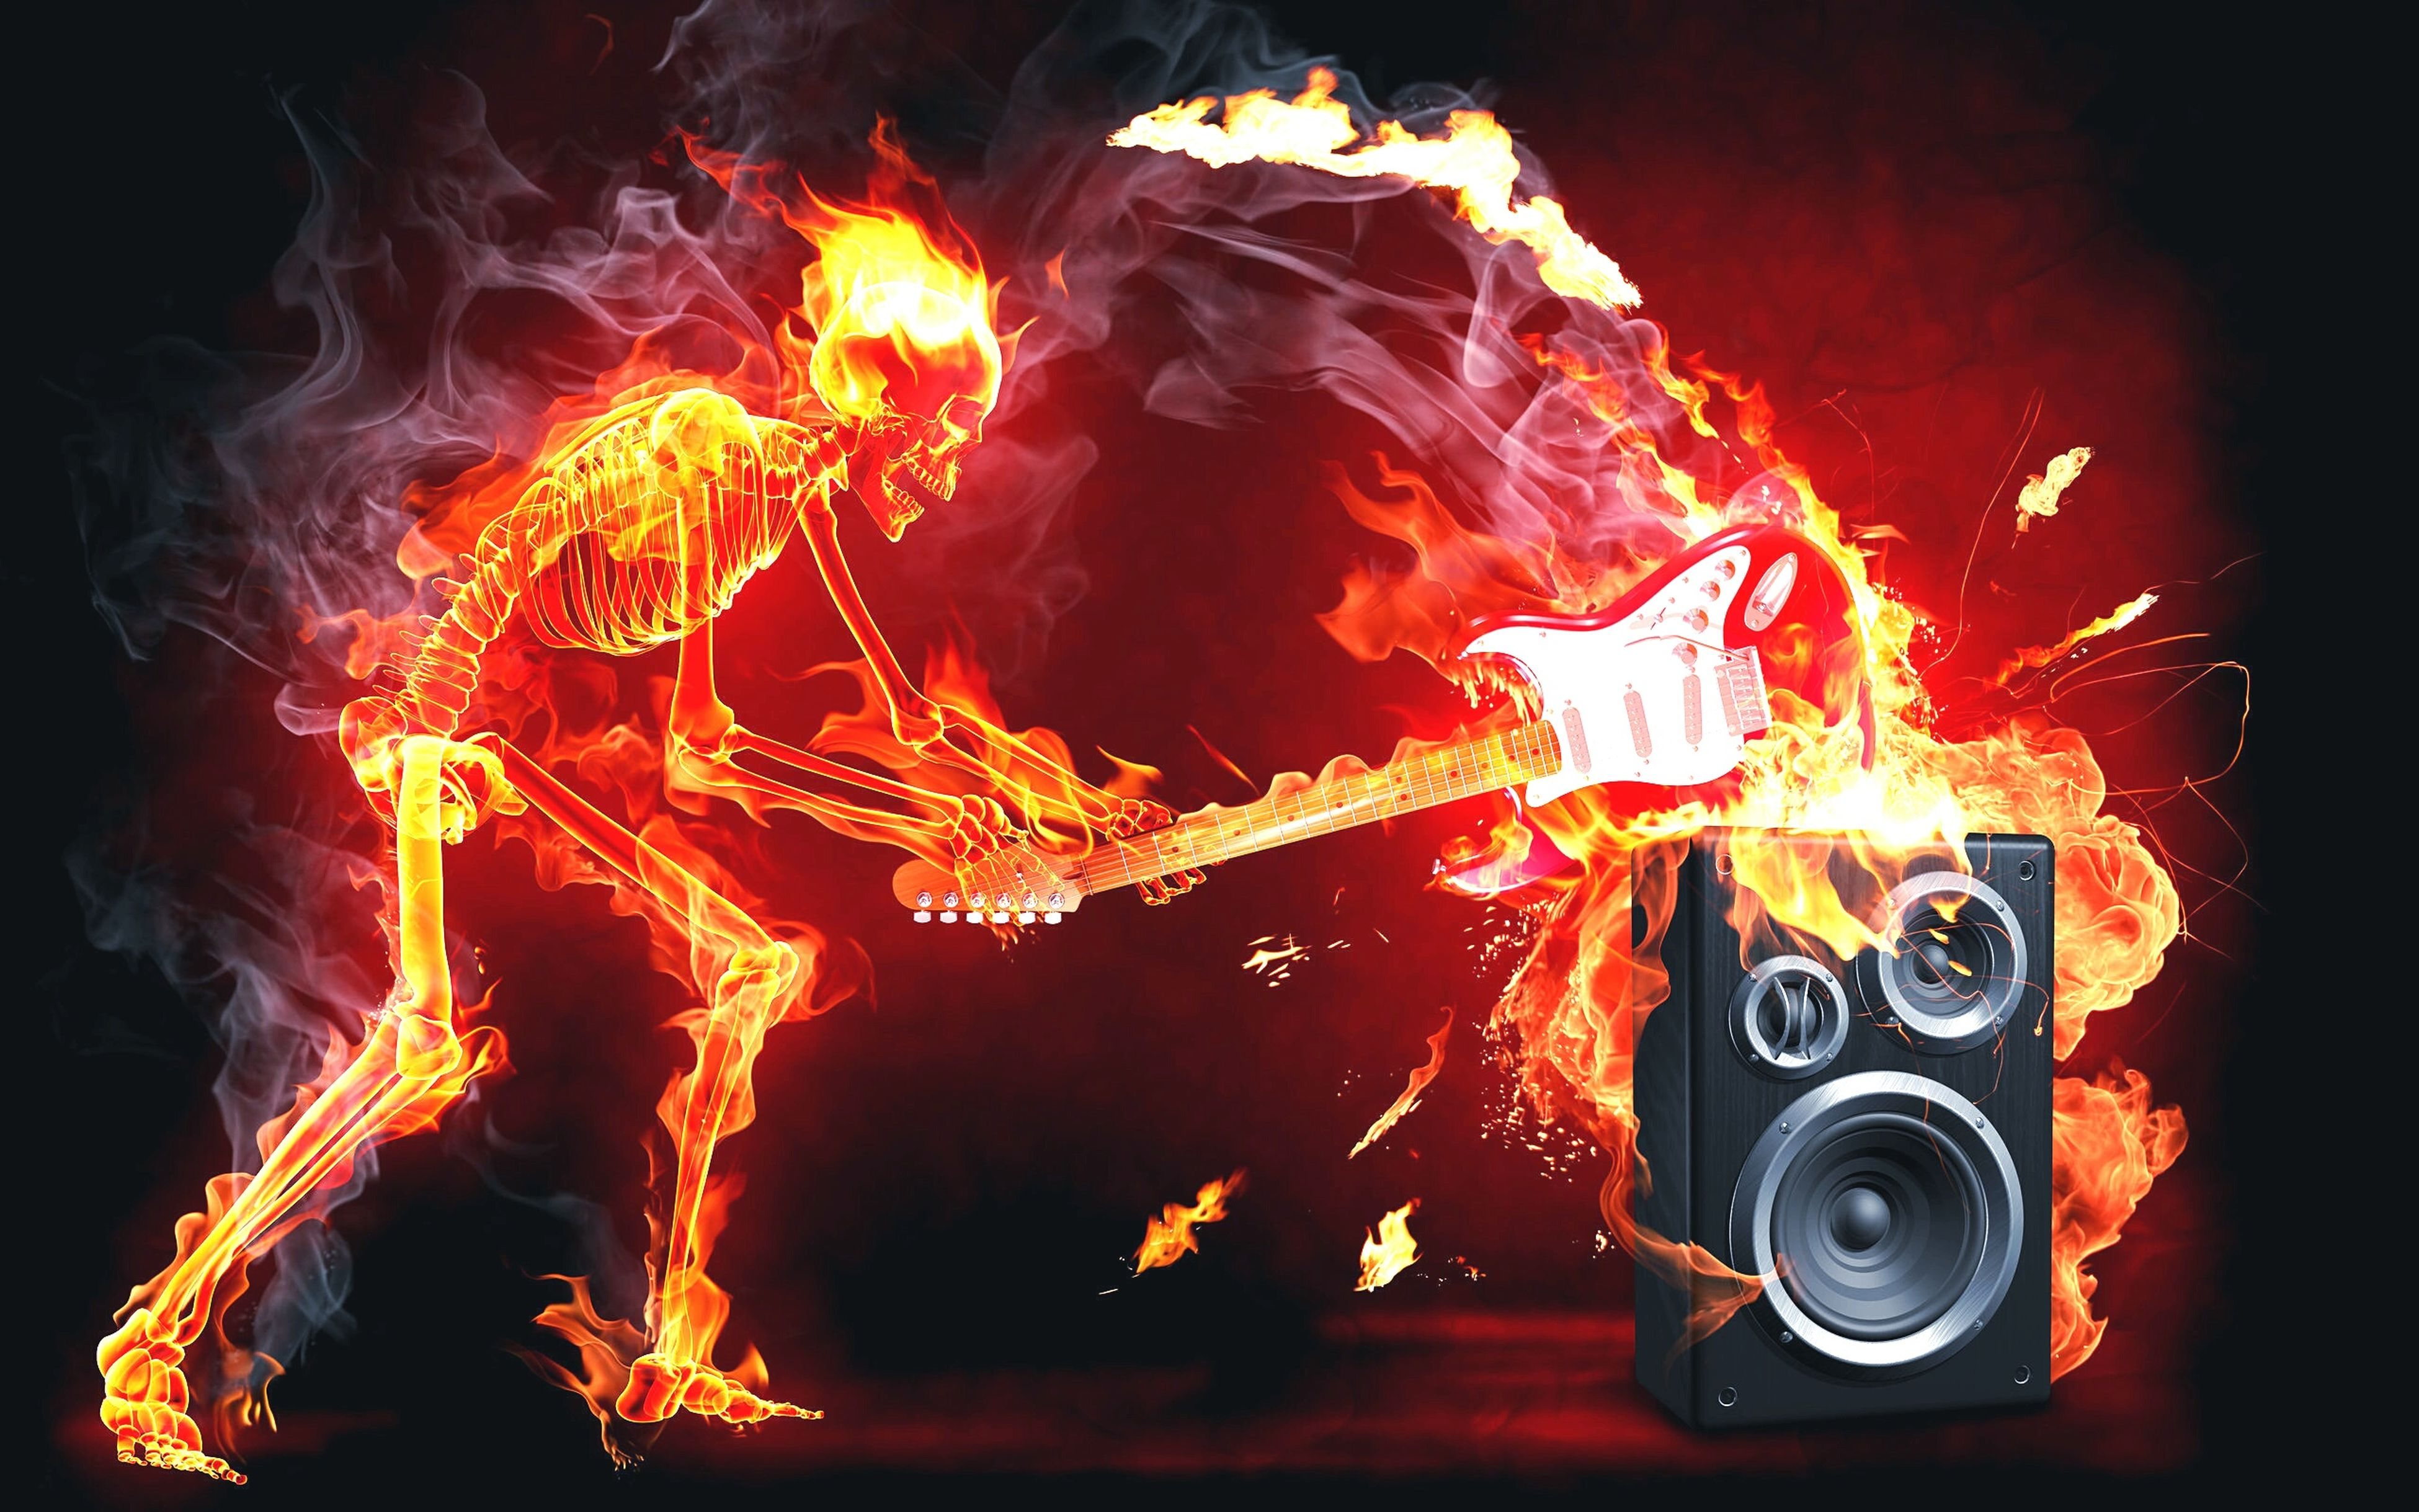 Fire Heavy Metal Rock'n'Roll Guitar Guitarists Music Band Tecnology Soobwoofer